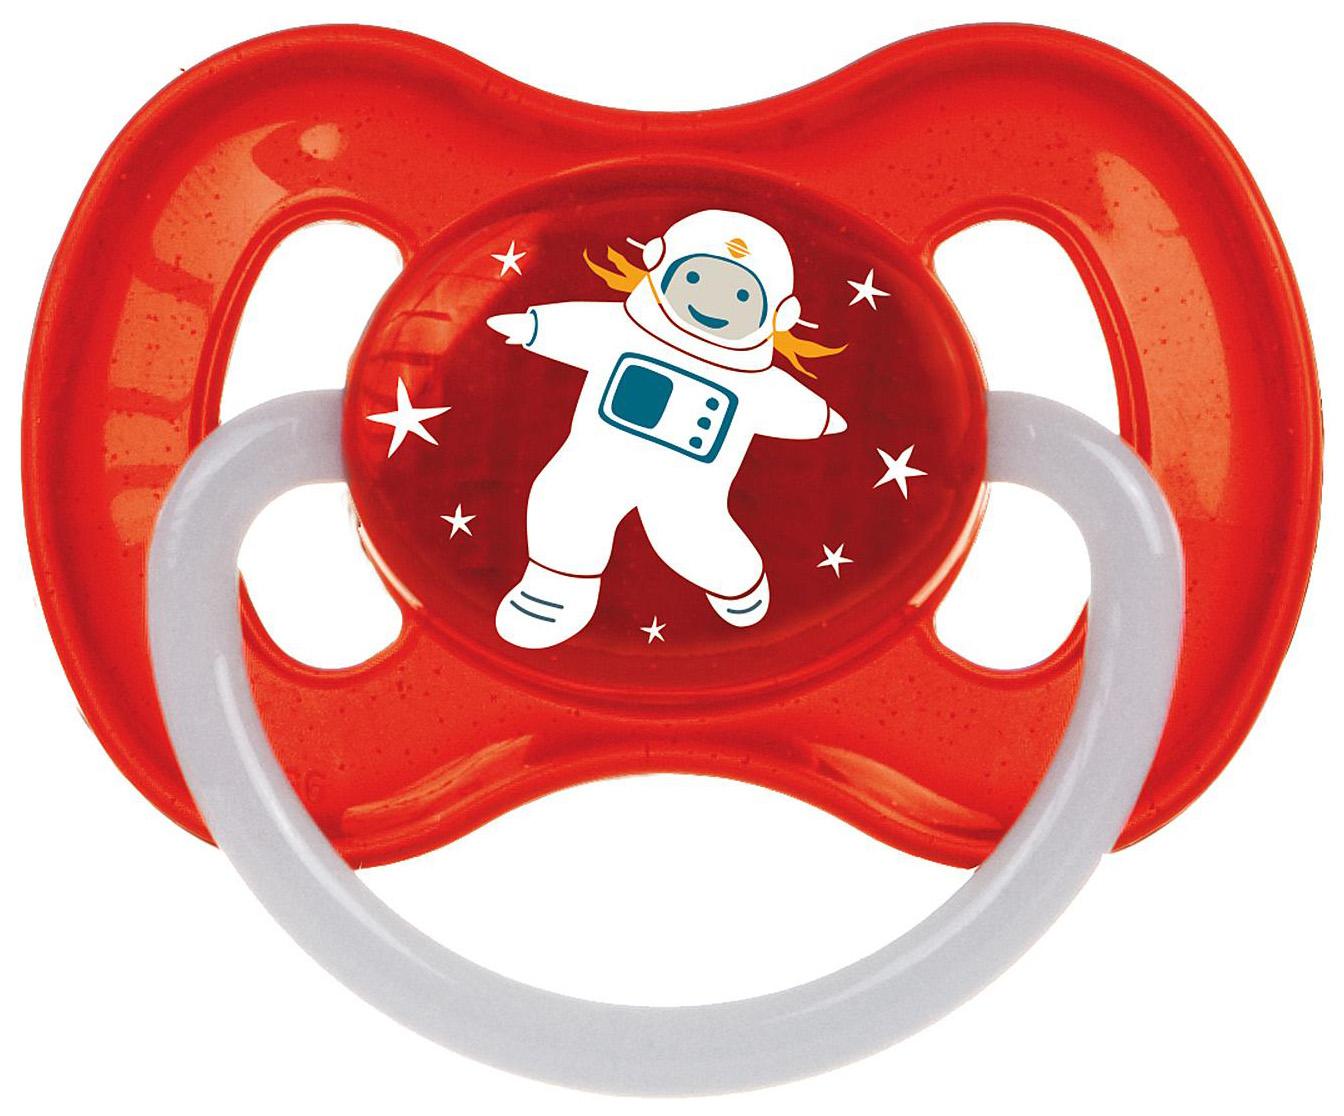 Пустышка латексная Canpol Babies Space 0-6 мес 23/221/Красный